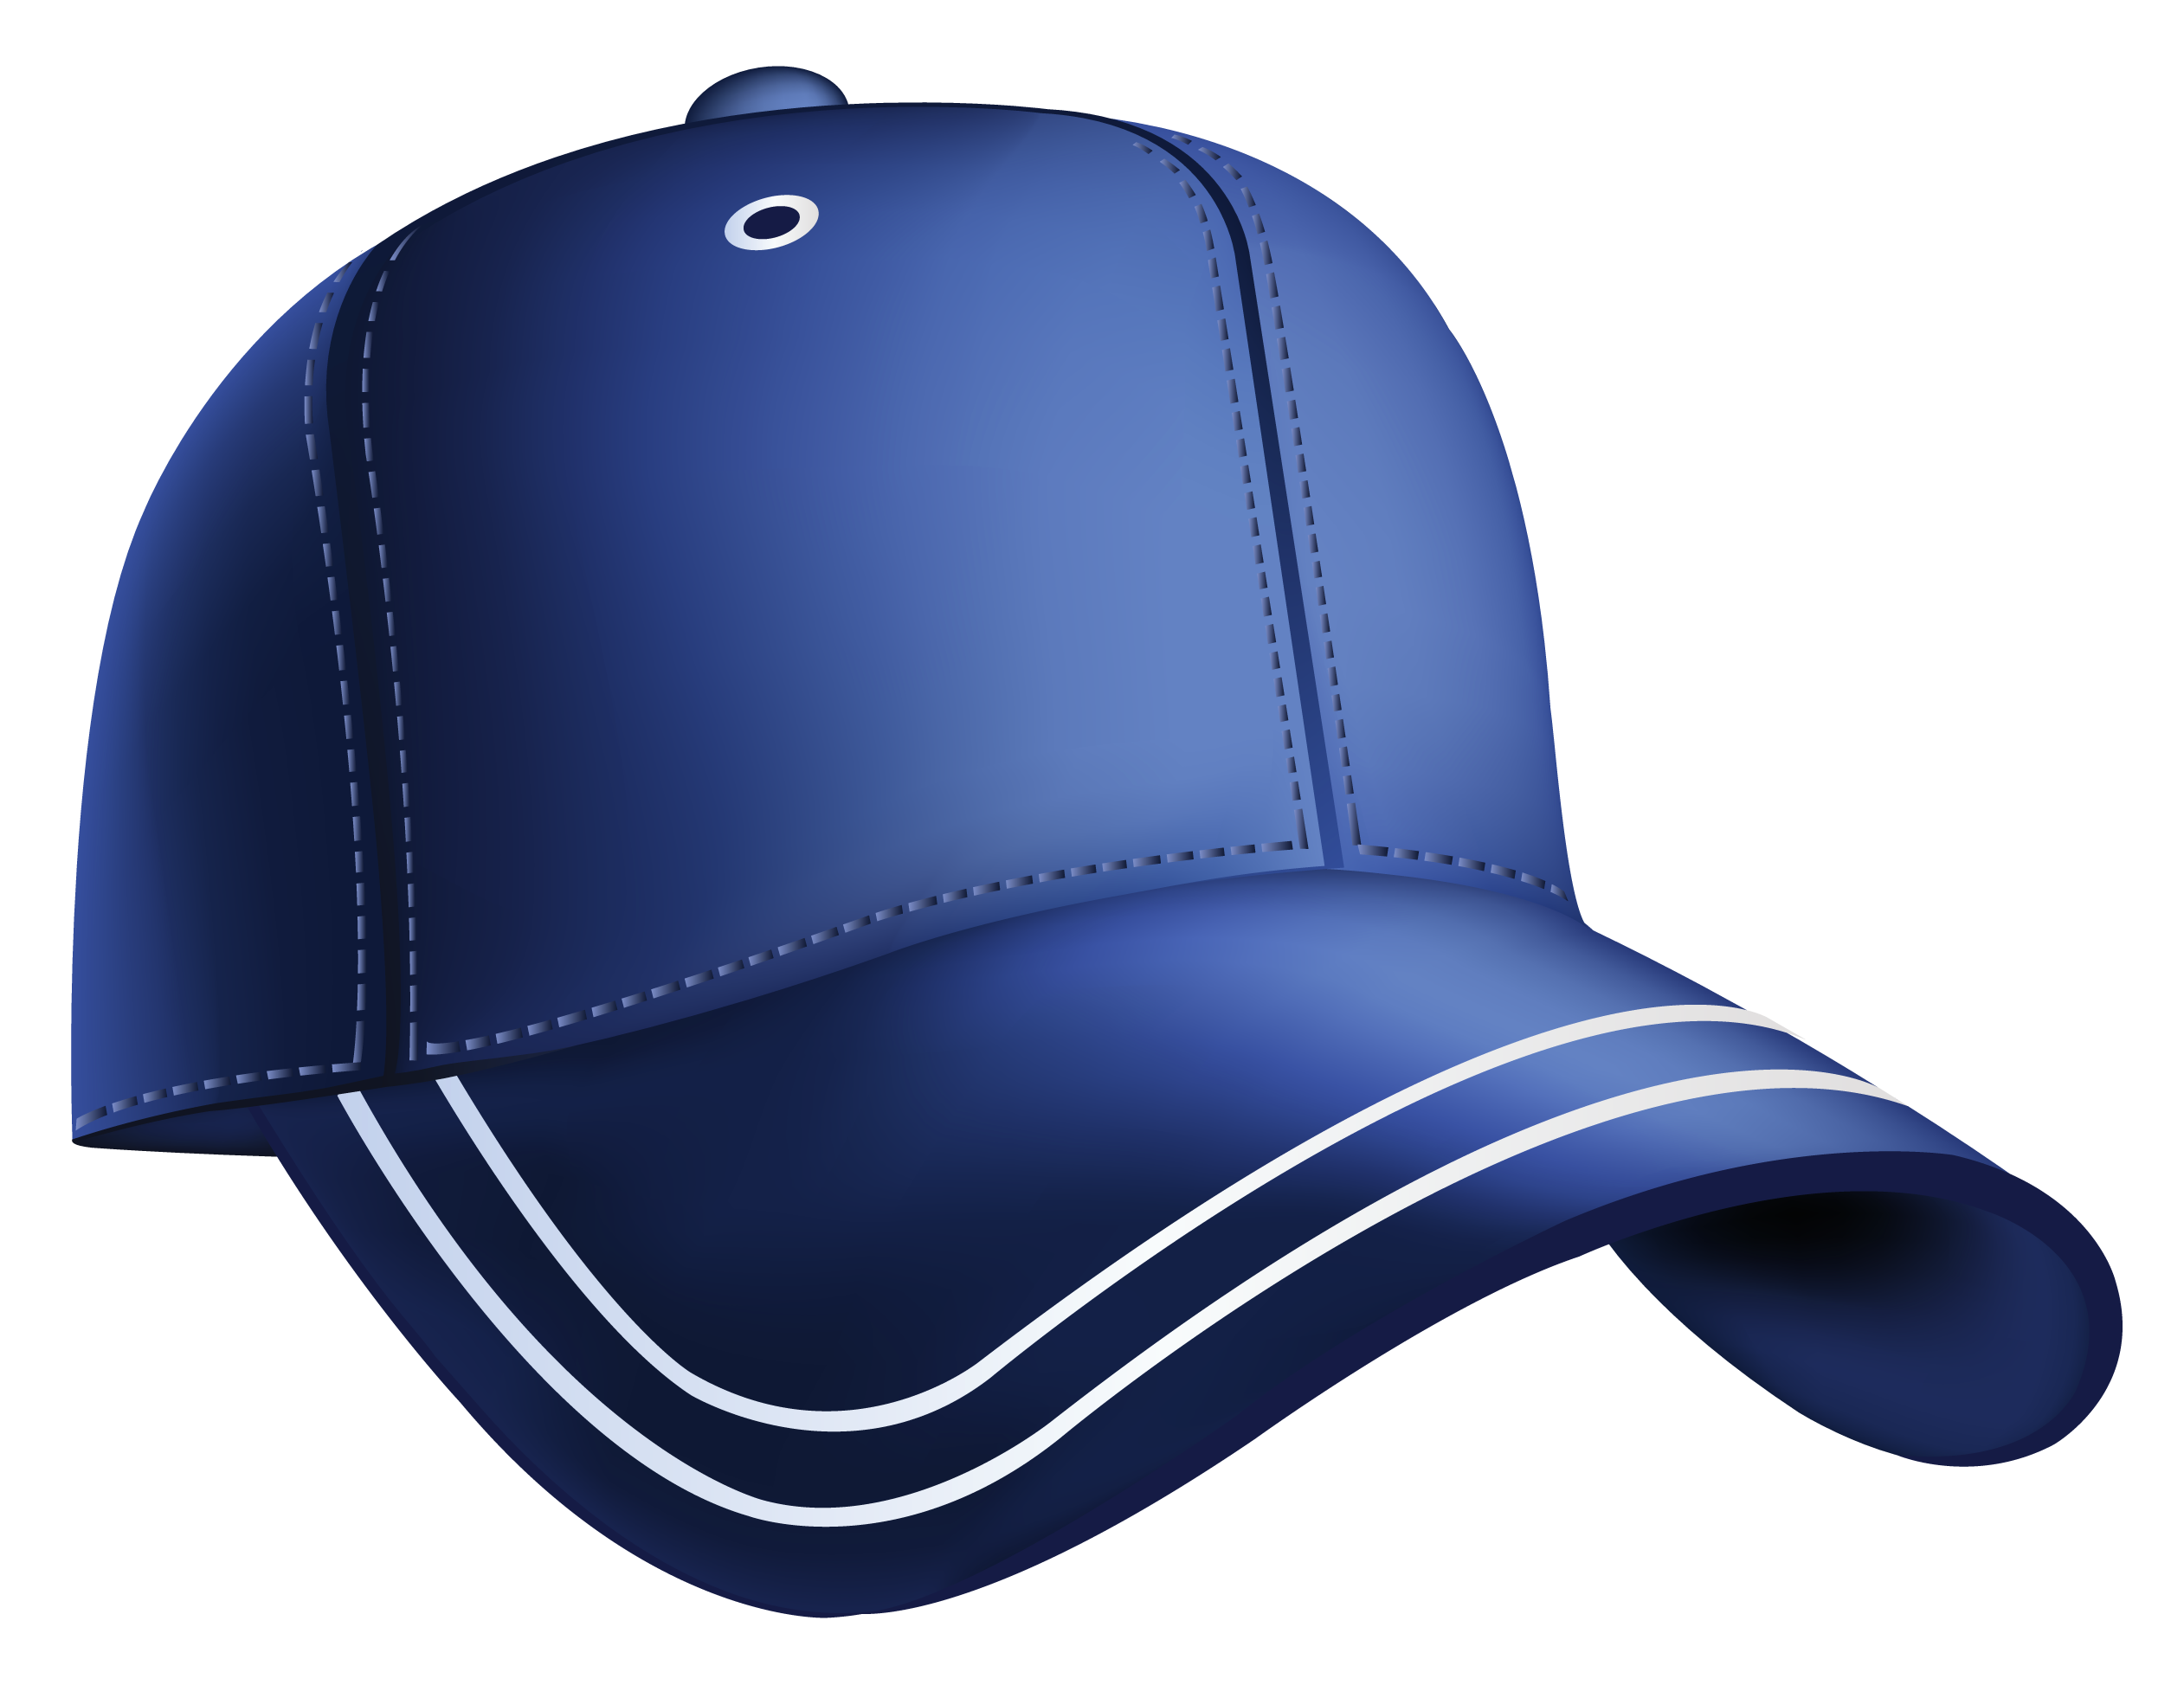 Cap vector clipart graphic free stock Baseball hat baseball cap clipart - WikiClipArt graphic free stock